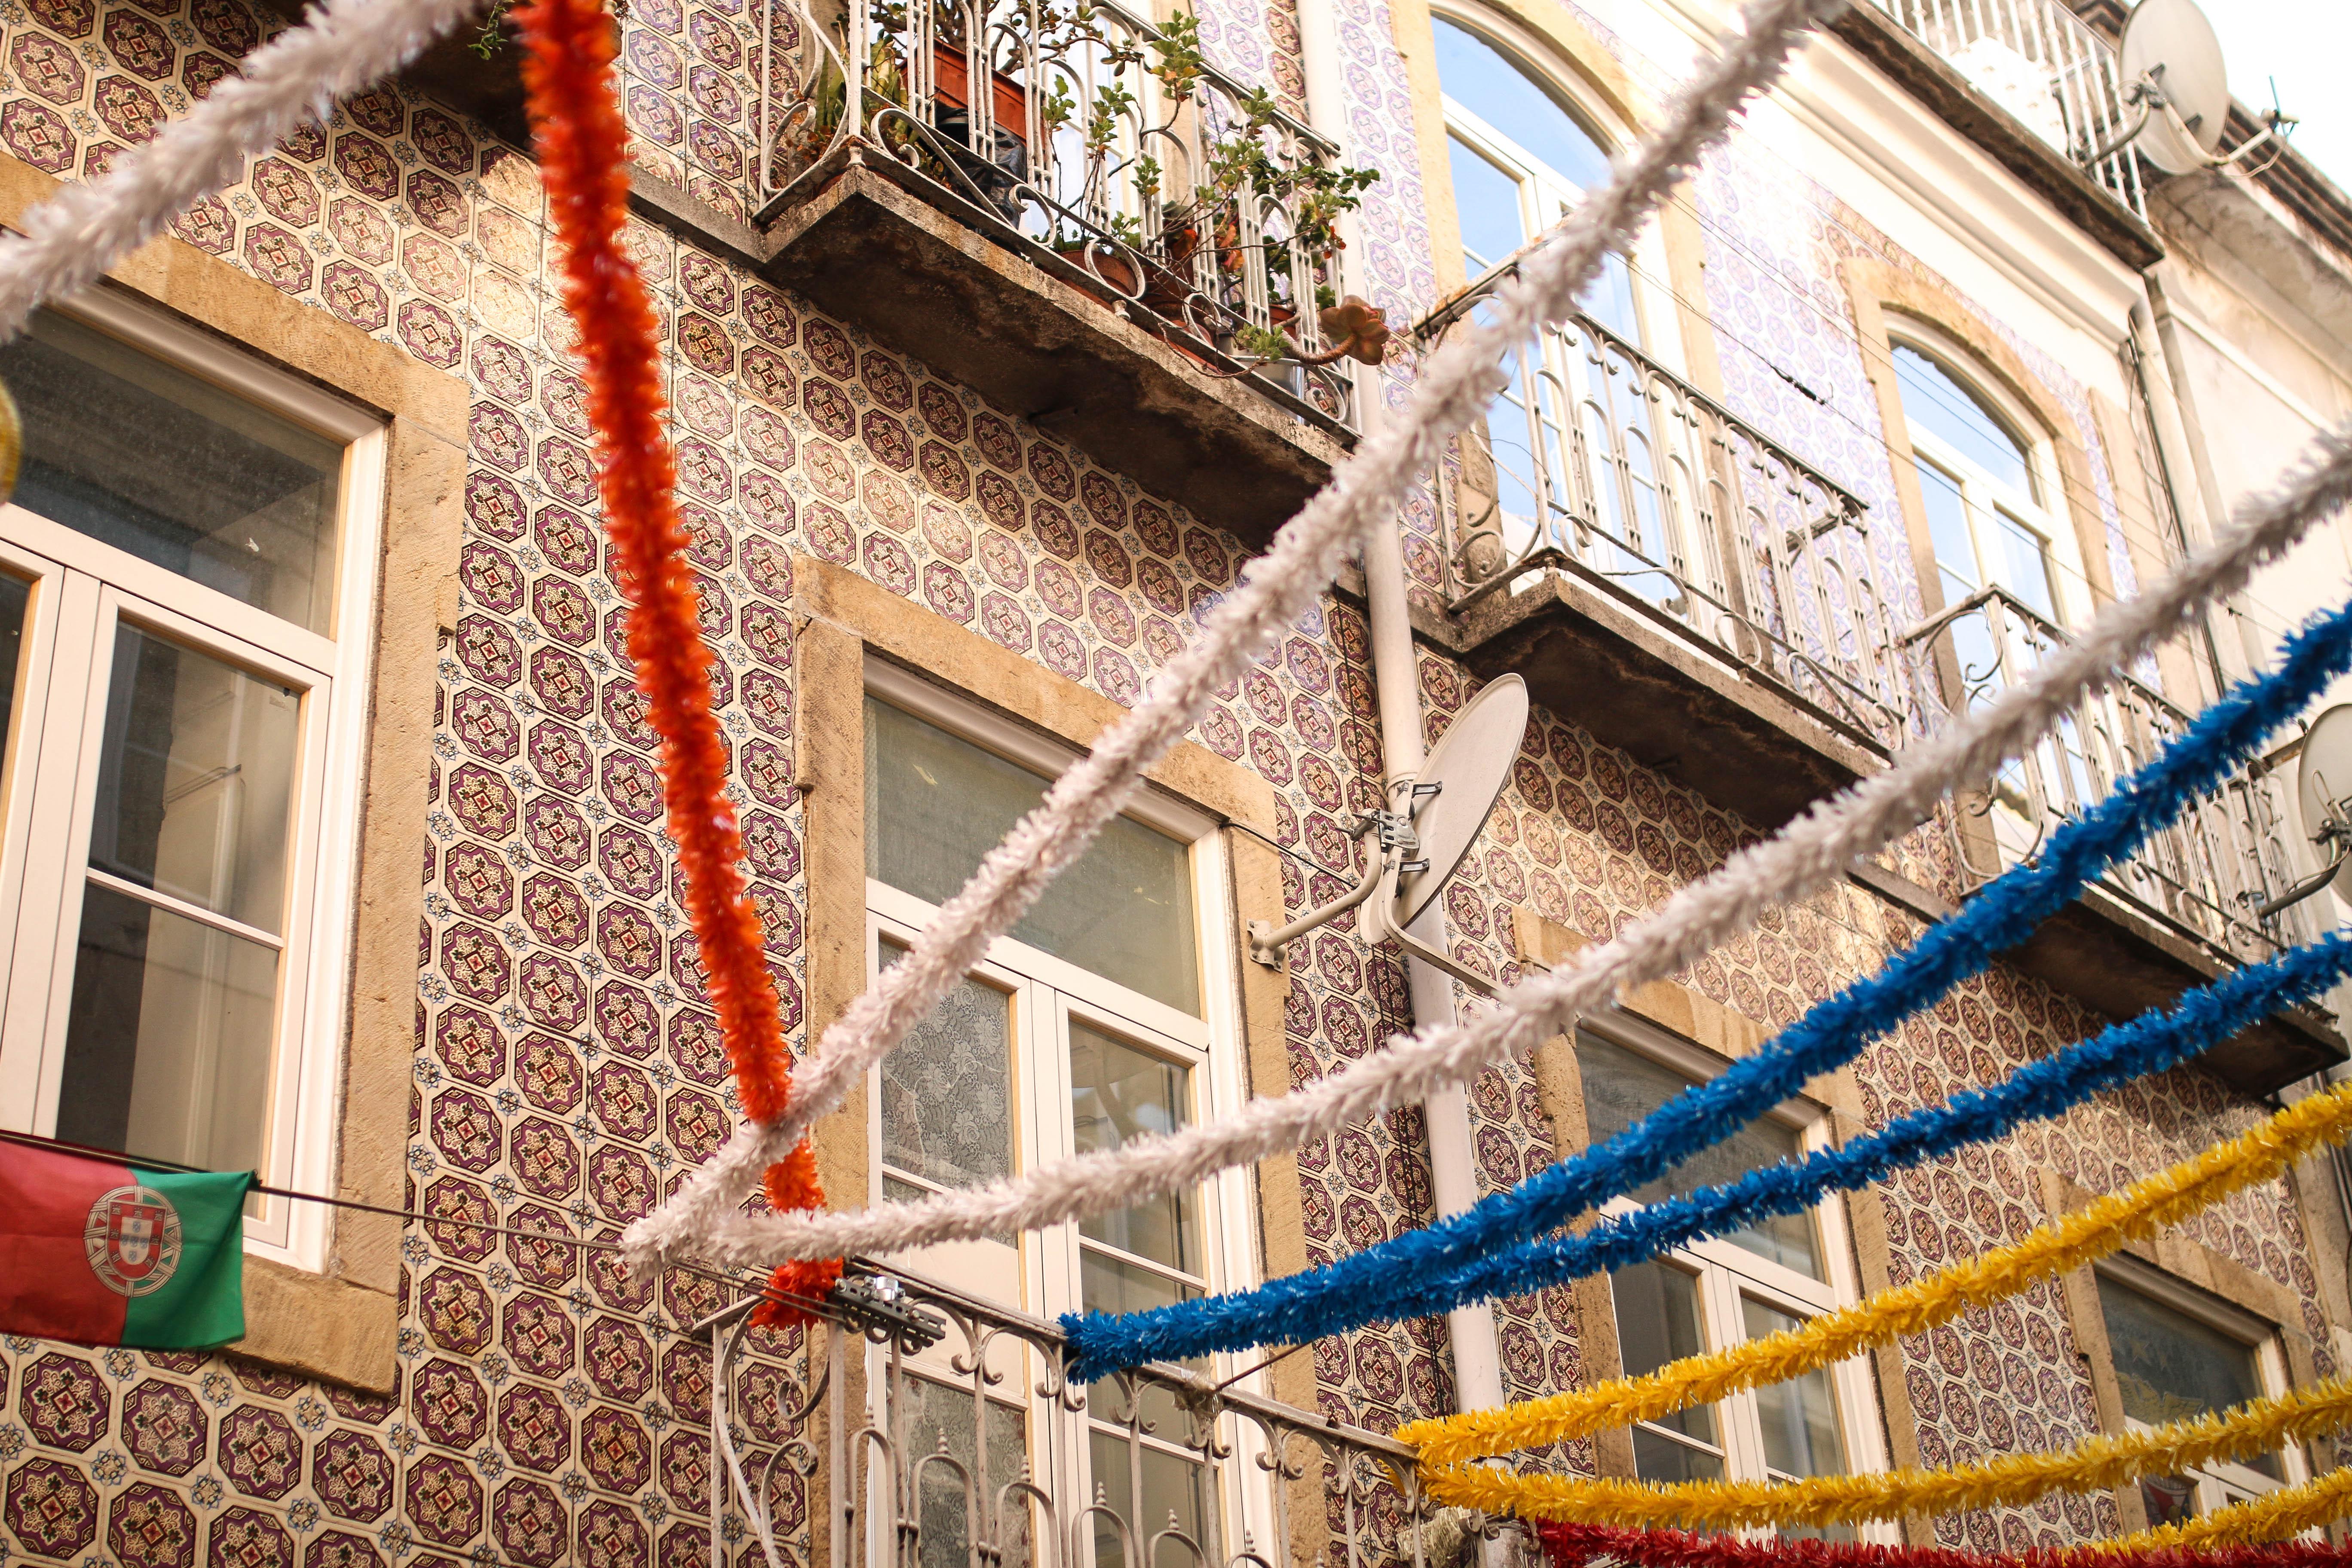 hot spots of lisbon bairro alto lissabon travel diary travel blog reiseblog